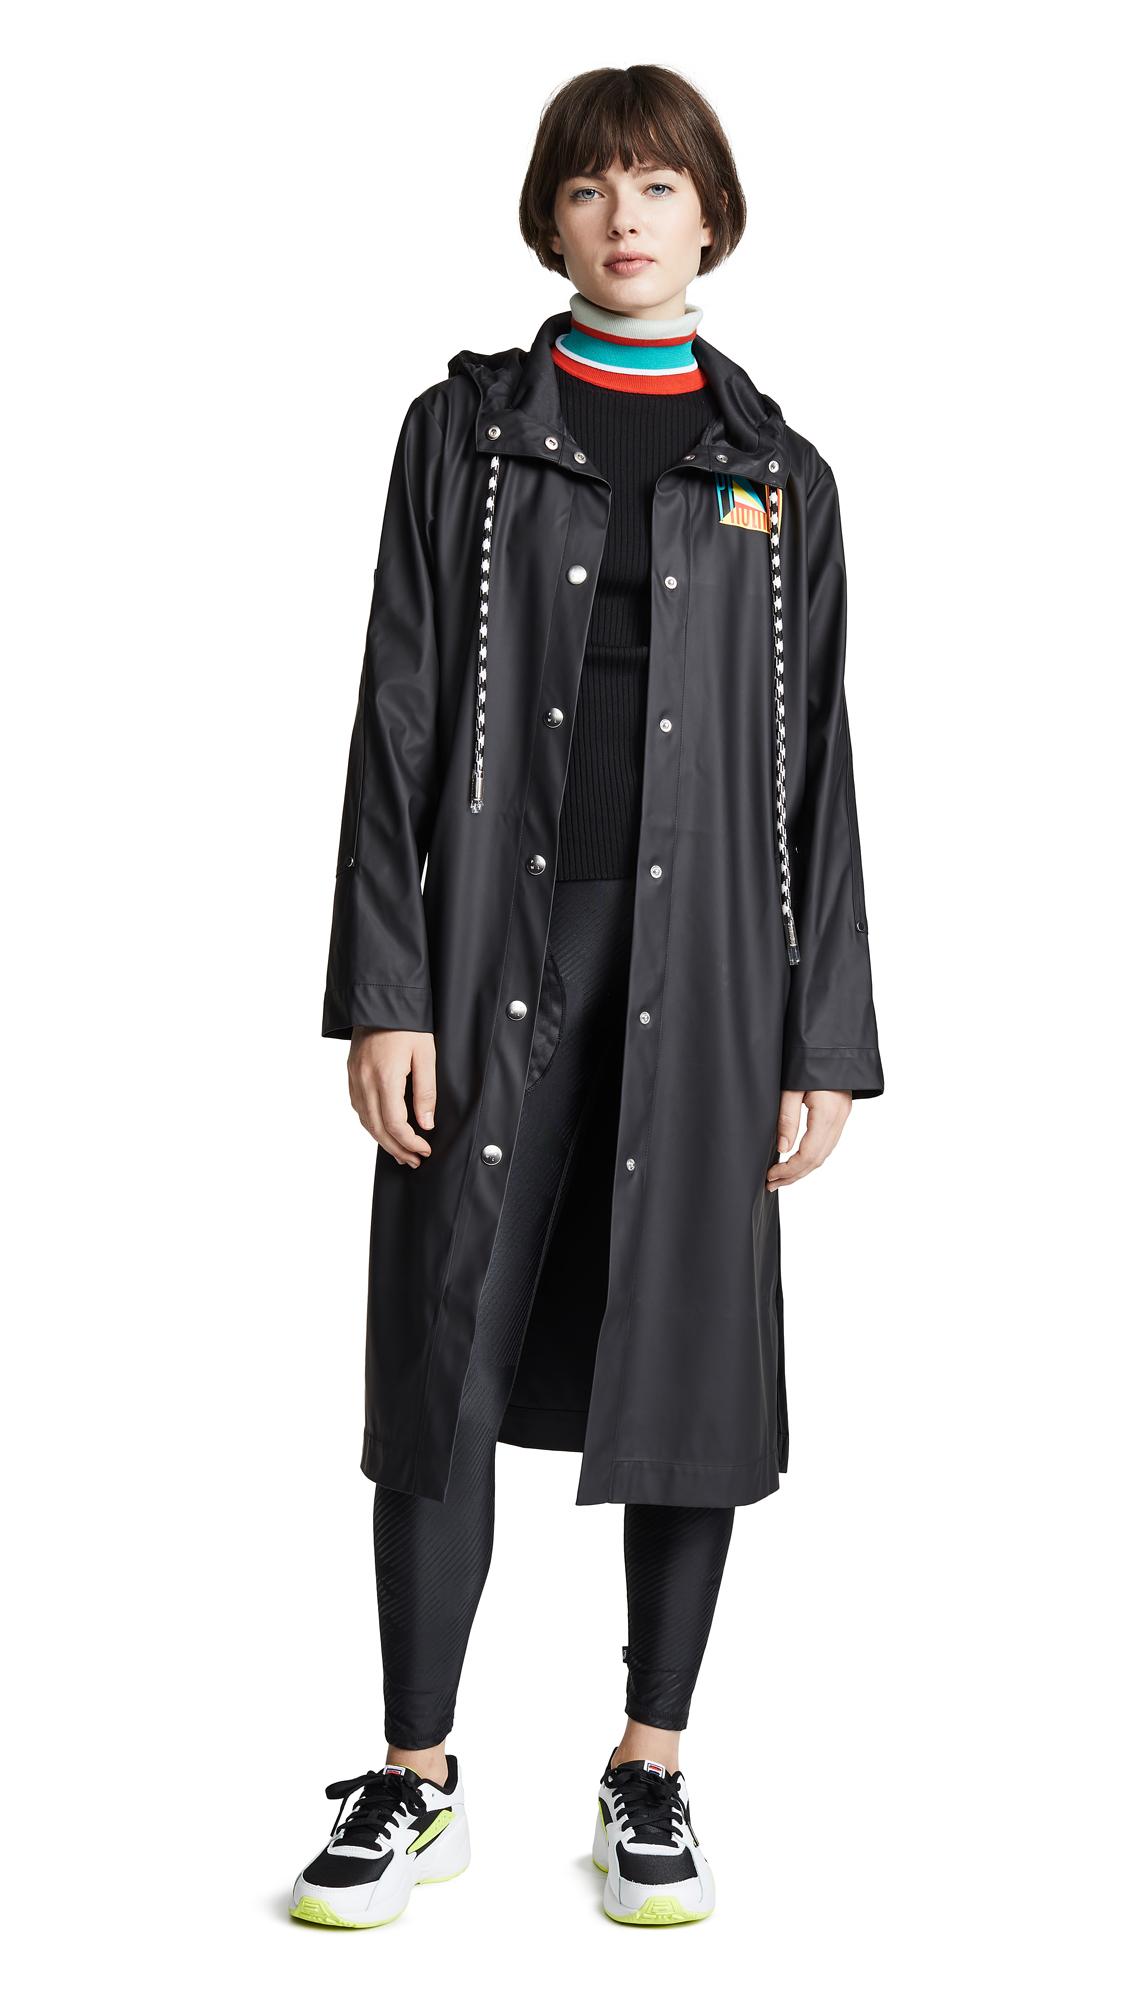 PSWL Rubber Raincoat